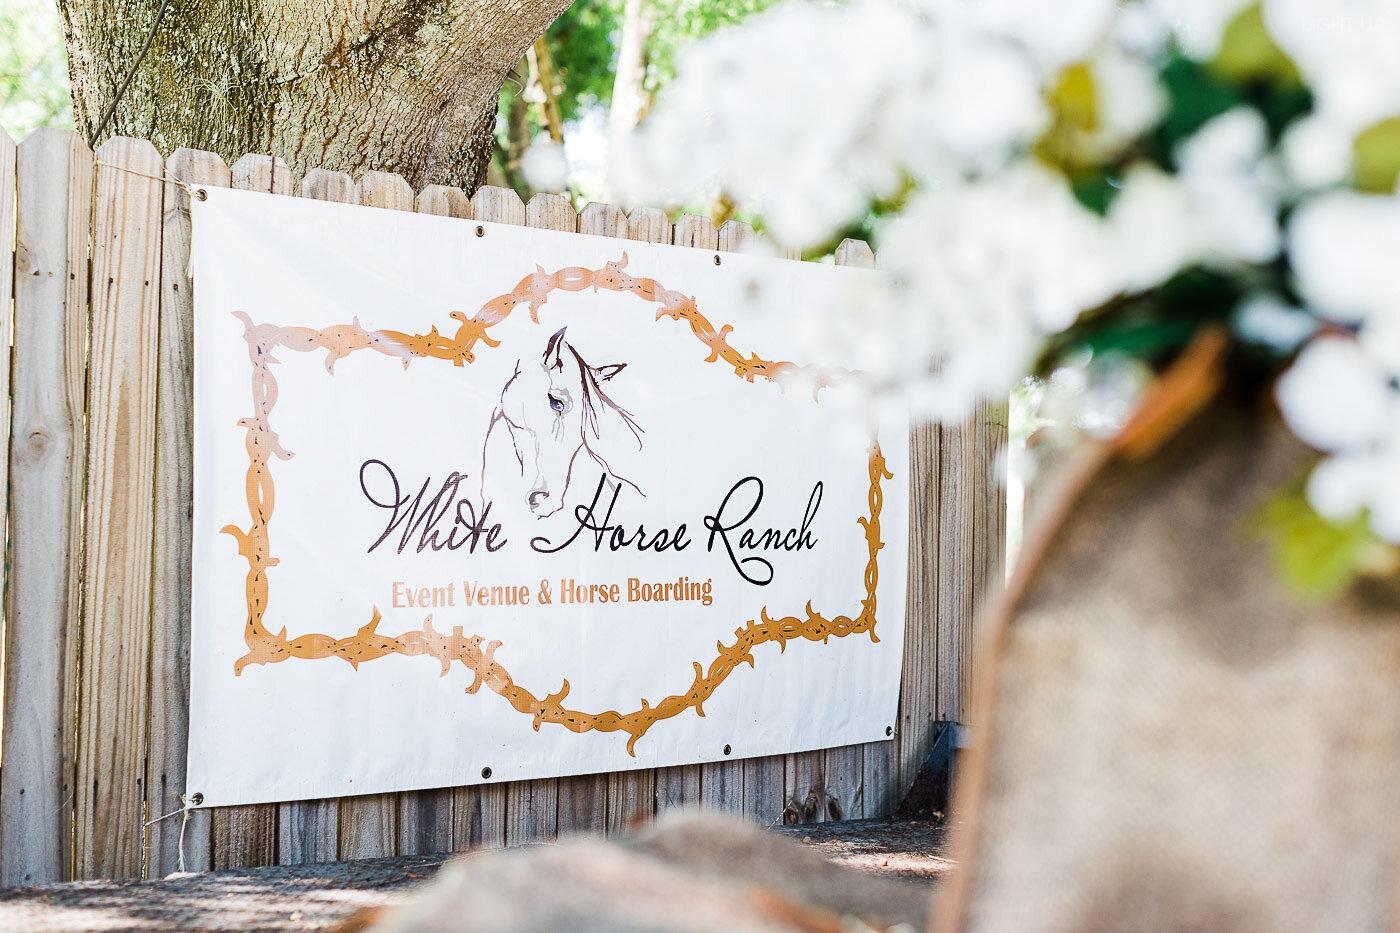 Lakeland-barn-wedding-at-white-horse-ranch-1.jpg